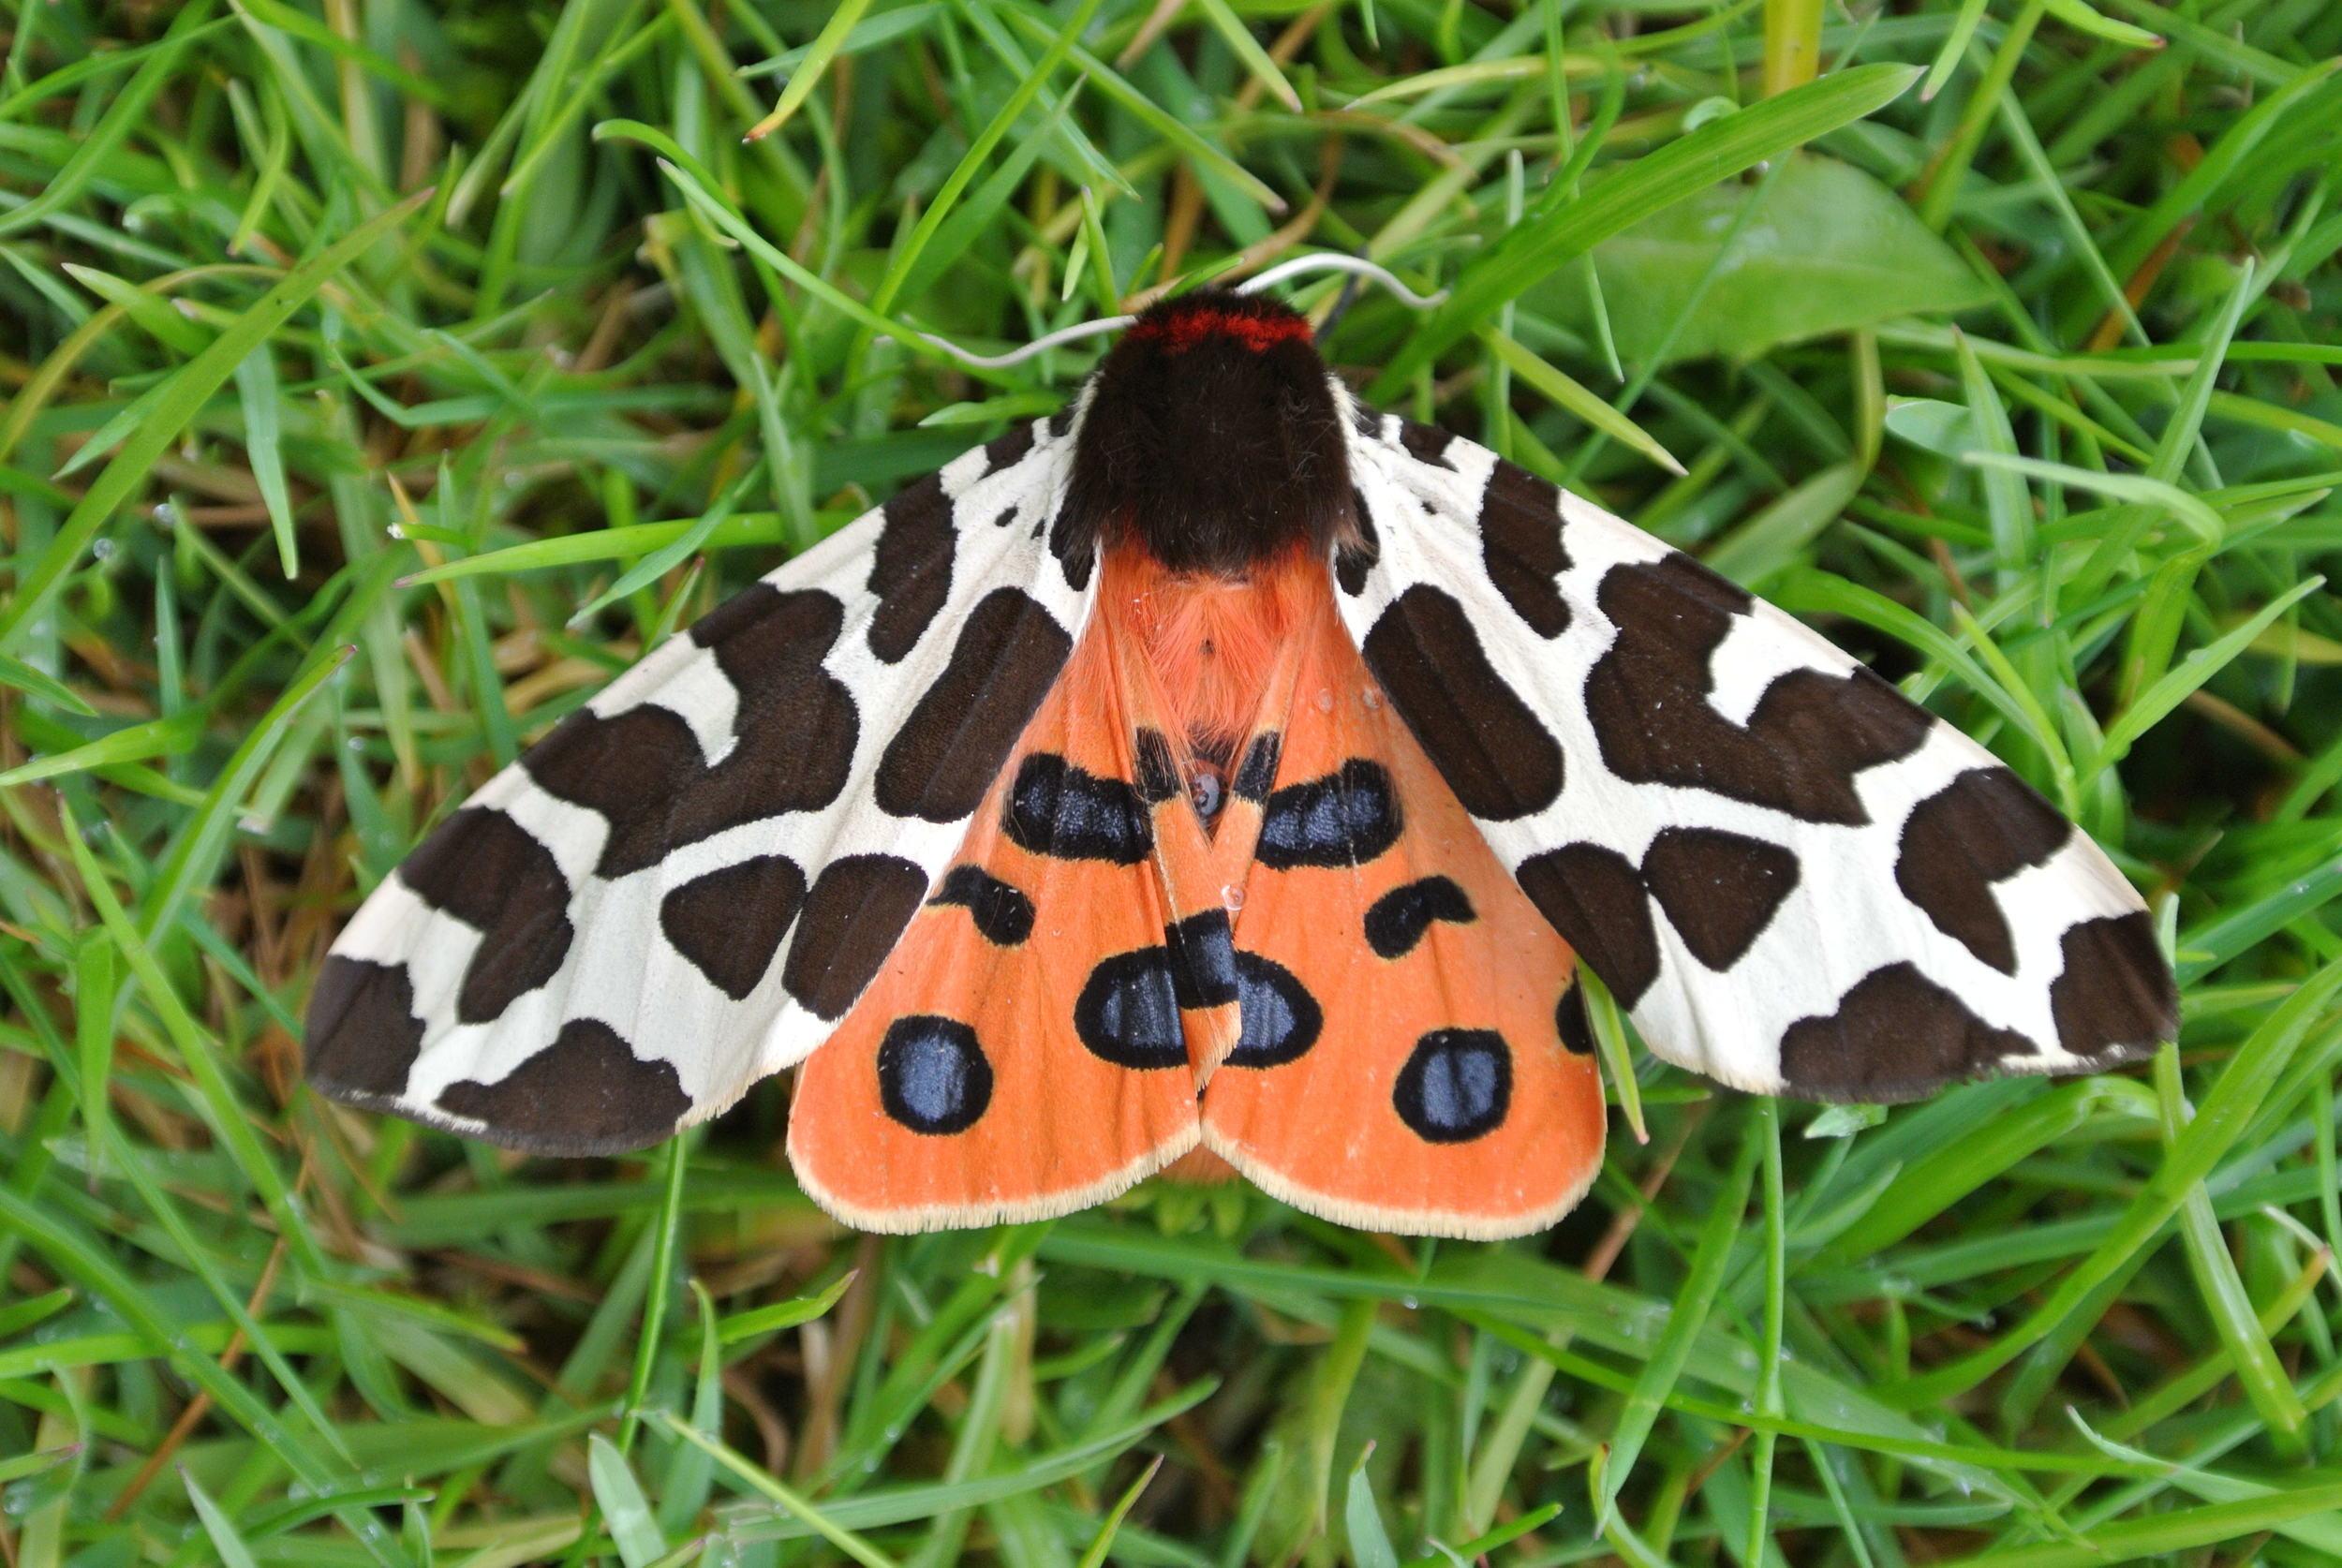 Tiger moth |  Temple of Mara/Wikimedia Commons  [ CC BY-SA 3.0 ]